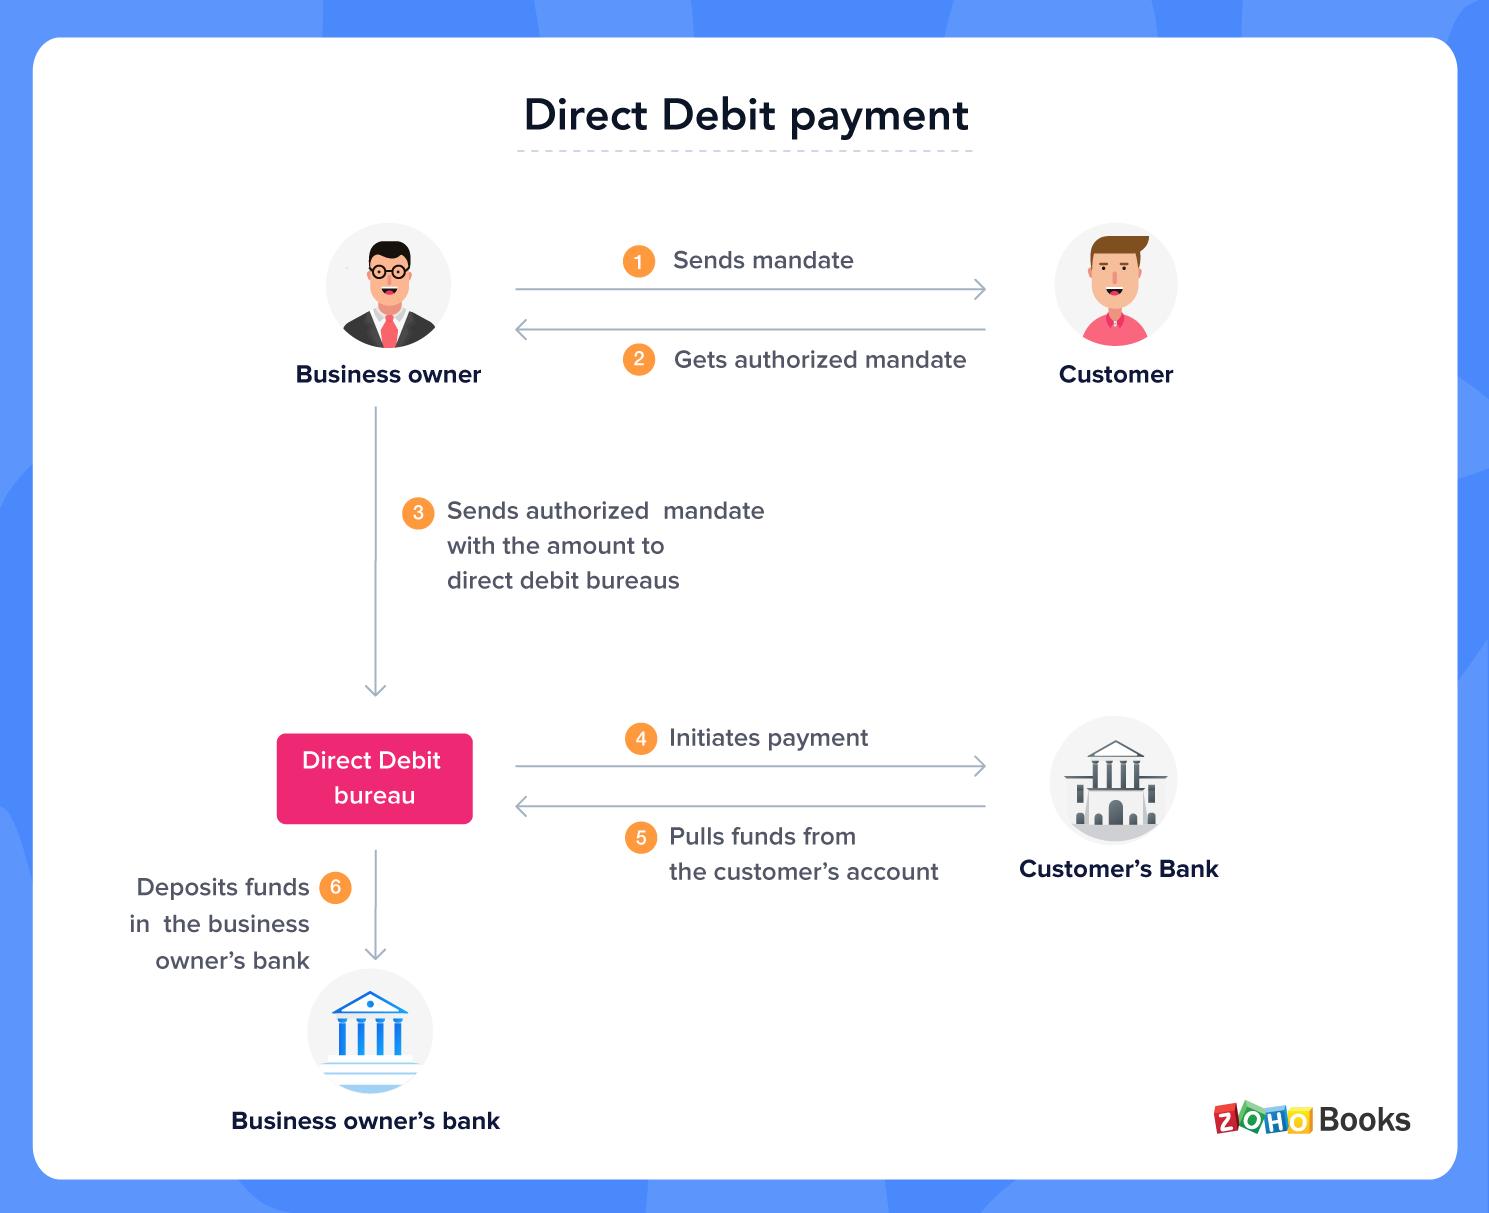 Direct Debit transaction